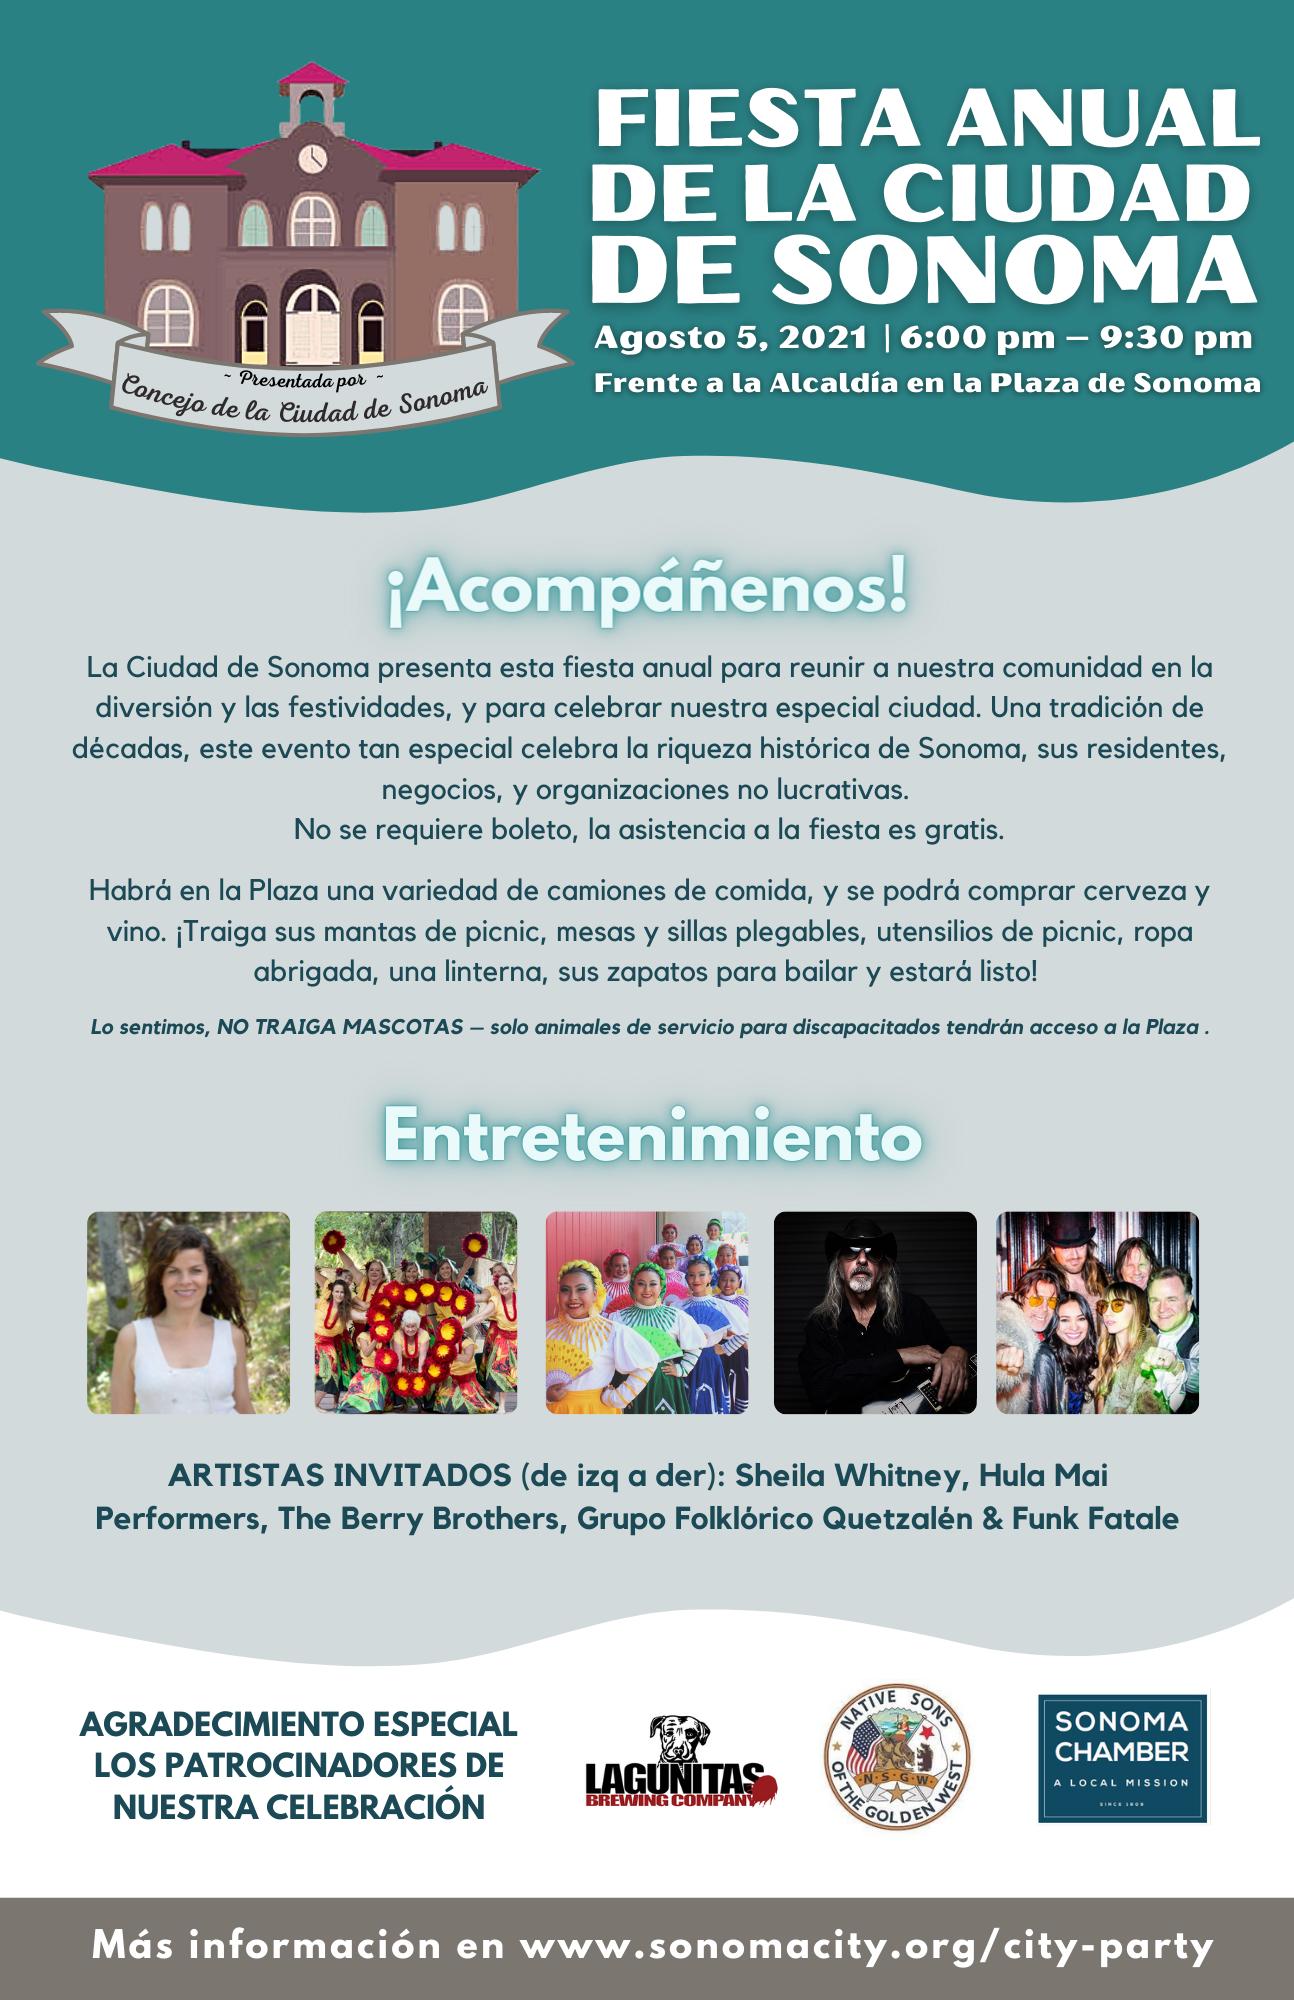 11x17 Sonoma City Party Flyer, Spanish